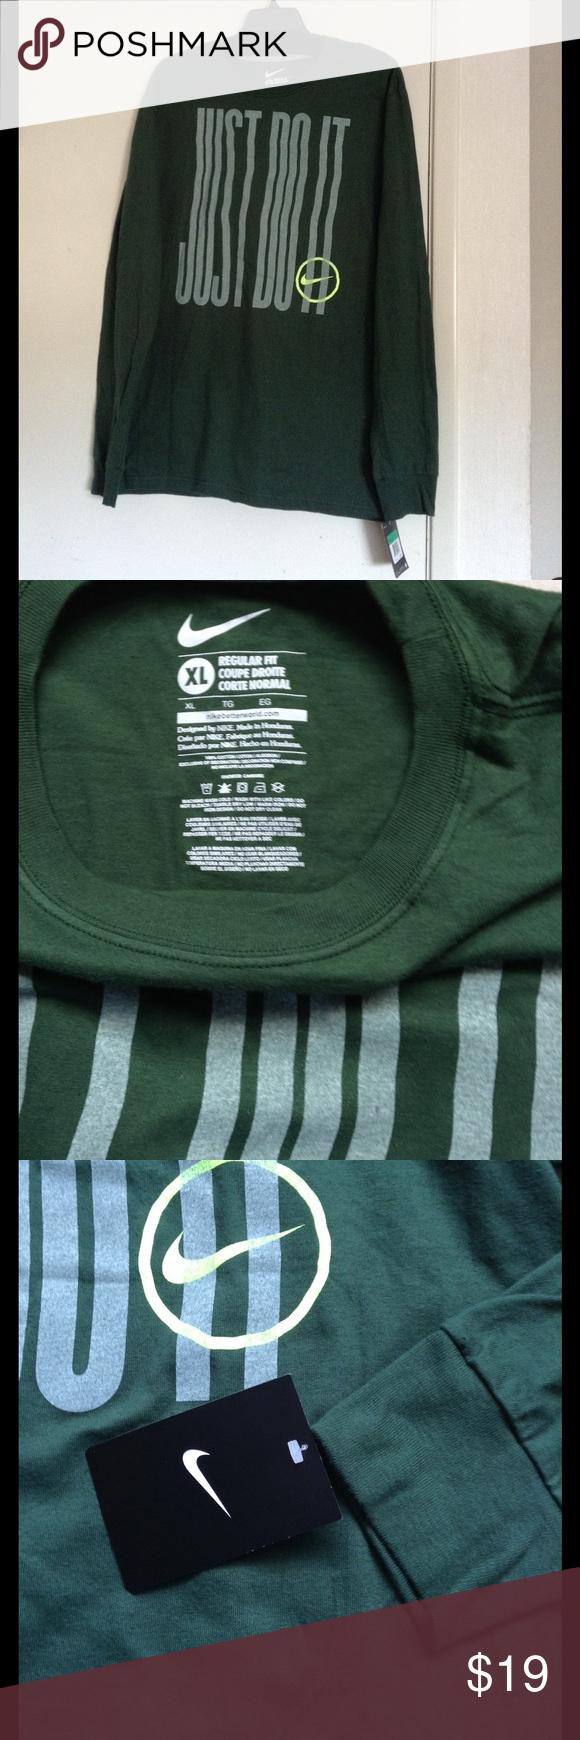 Men's Nike Long Sleeve Tee Forrest green Dri fit Regular t-shirt Nike Shirts Tees - Long Sleeve